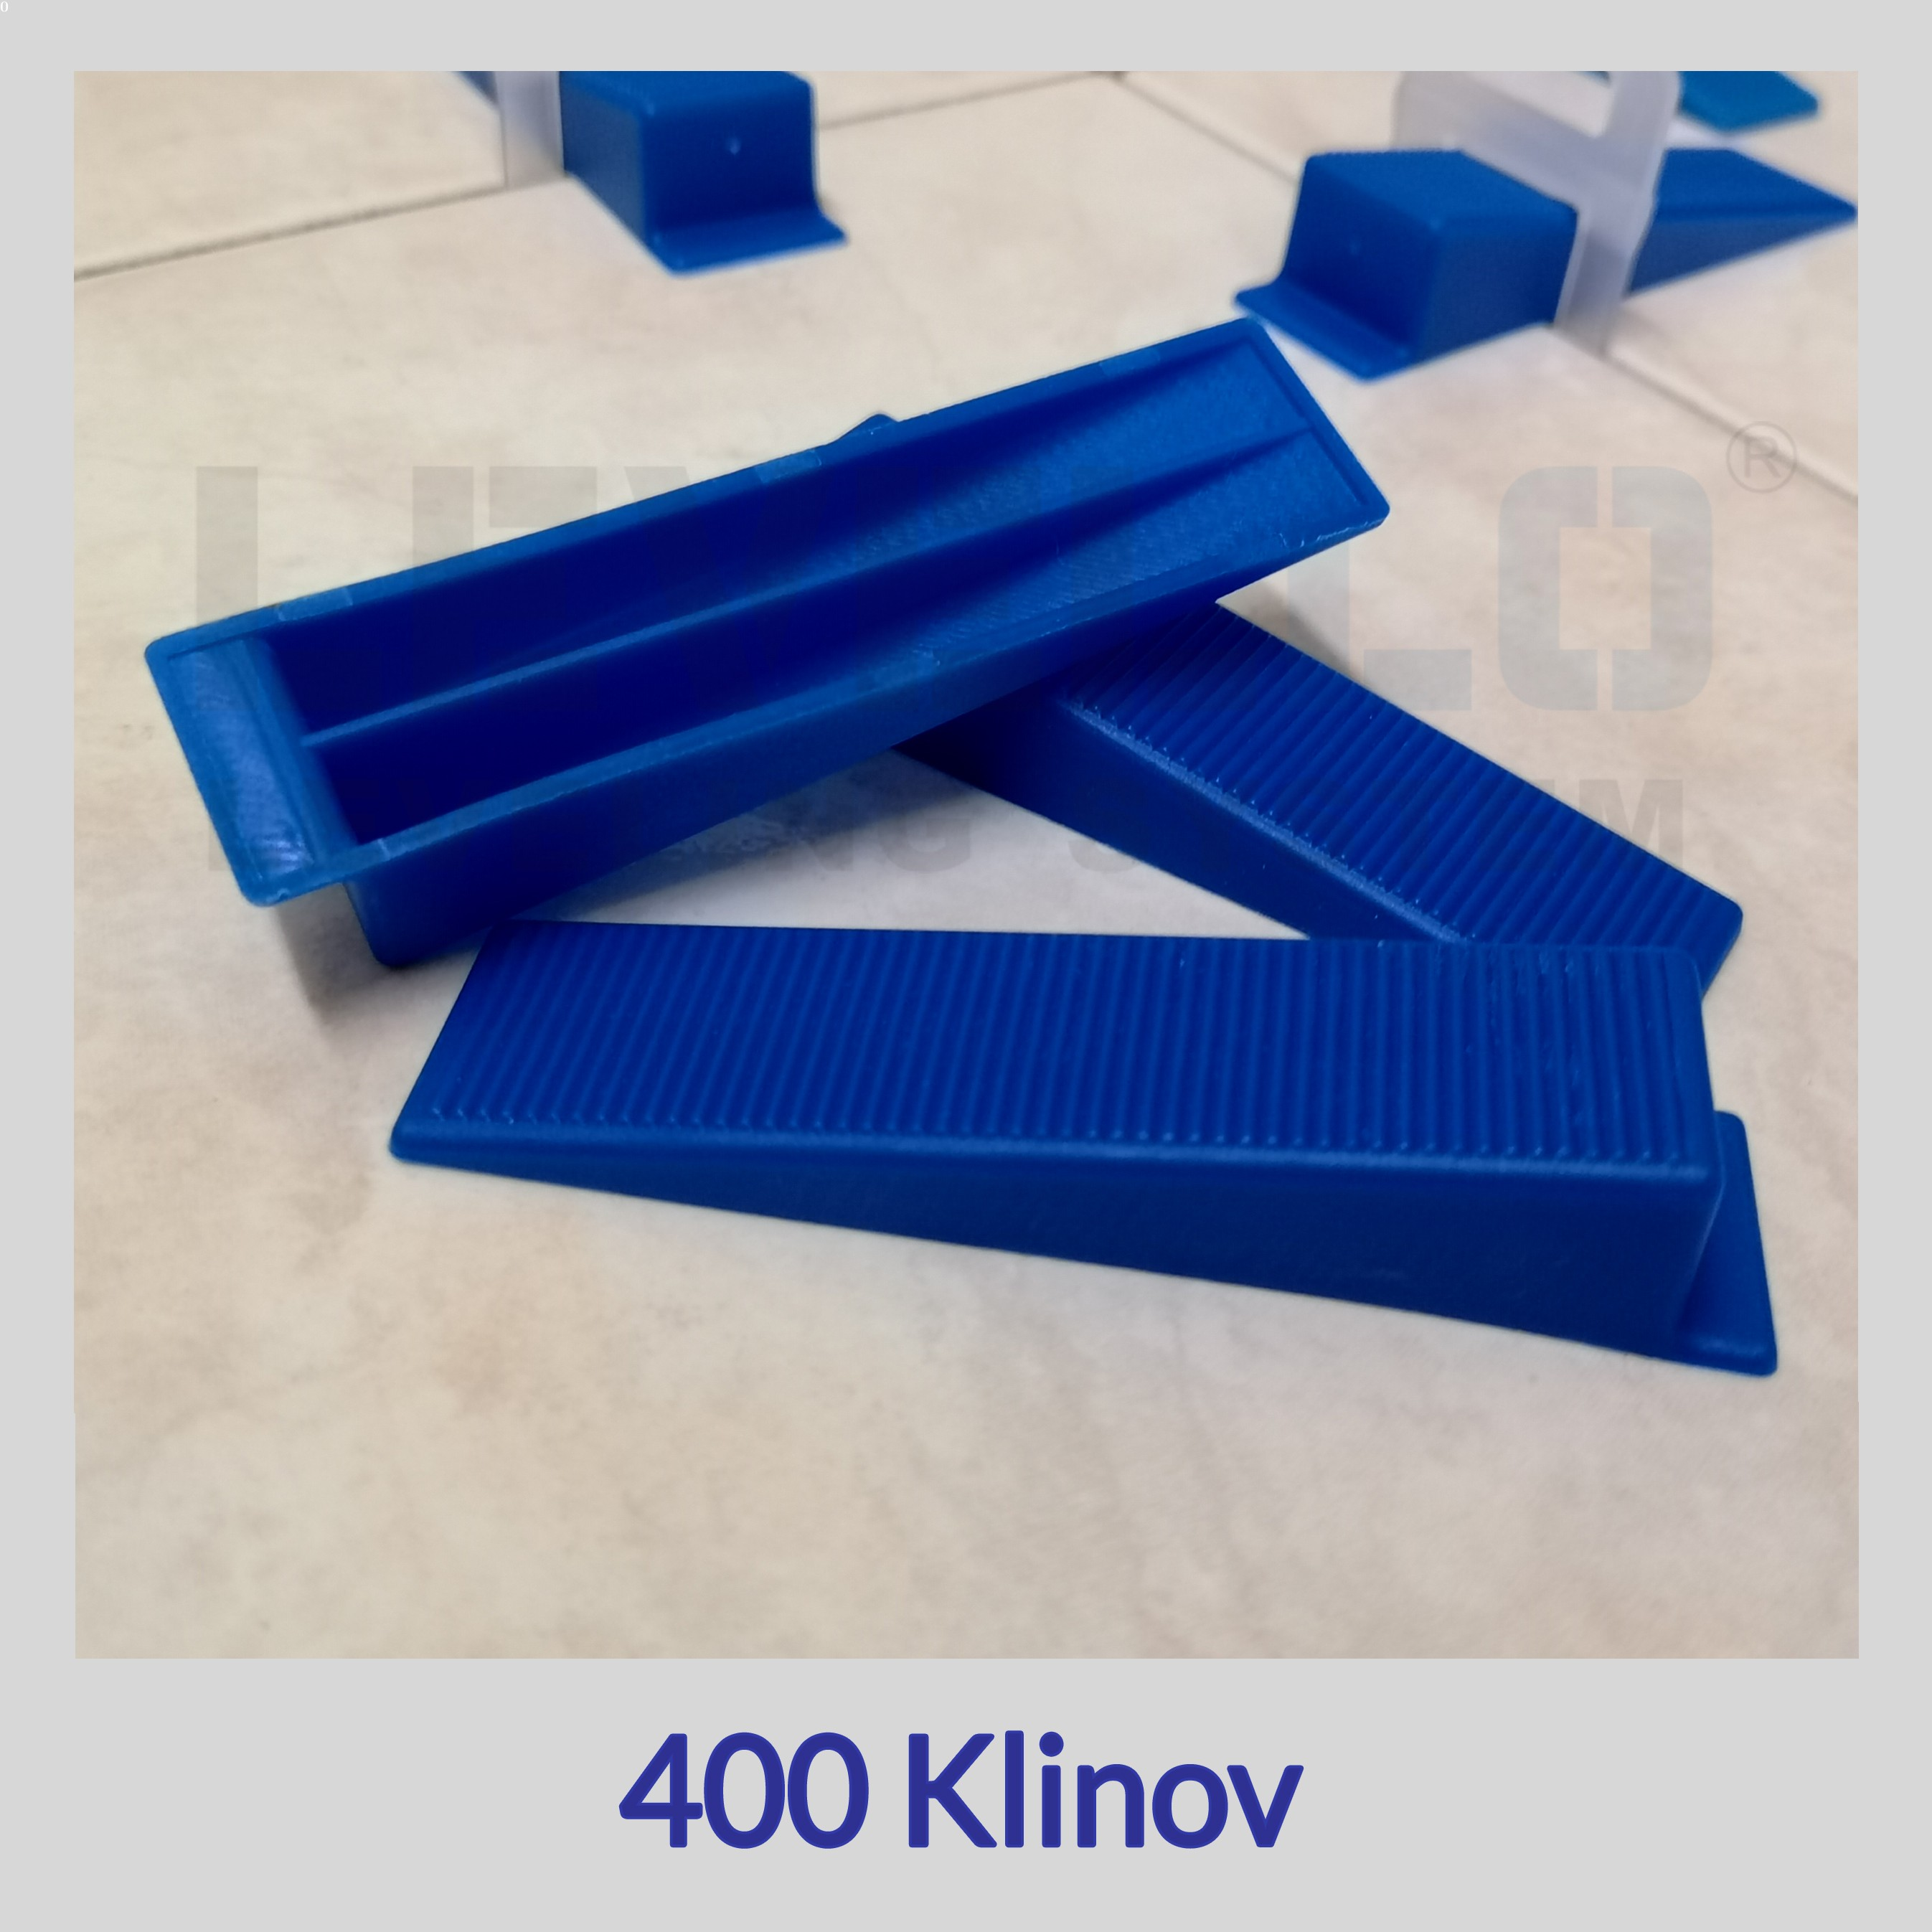 Nivelačné kliny modré, 400 kusov